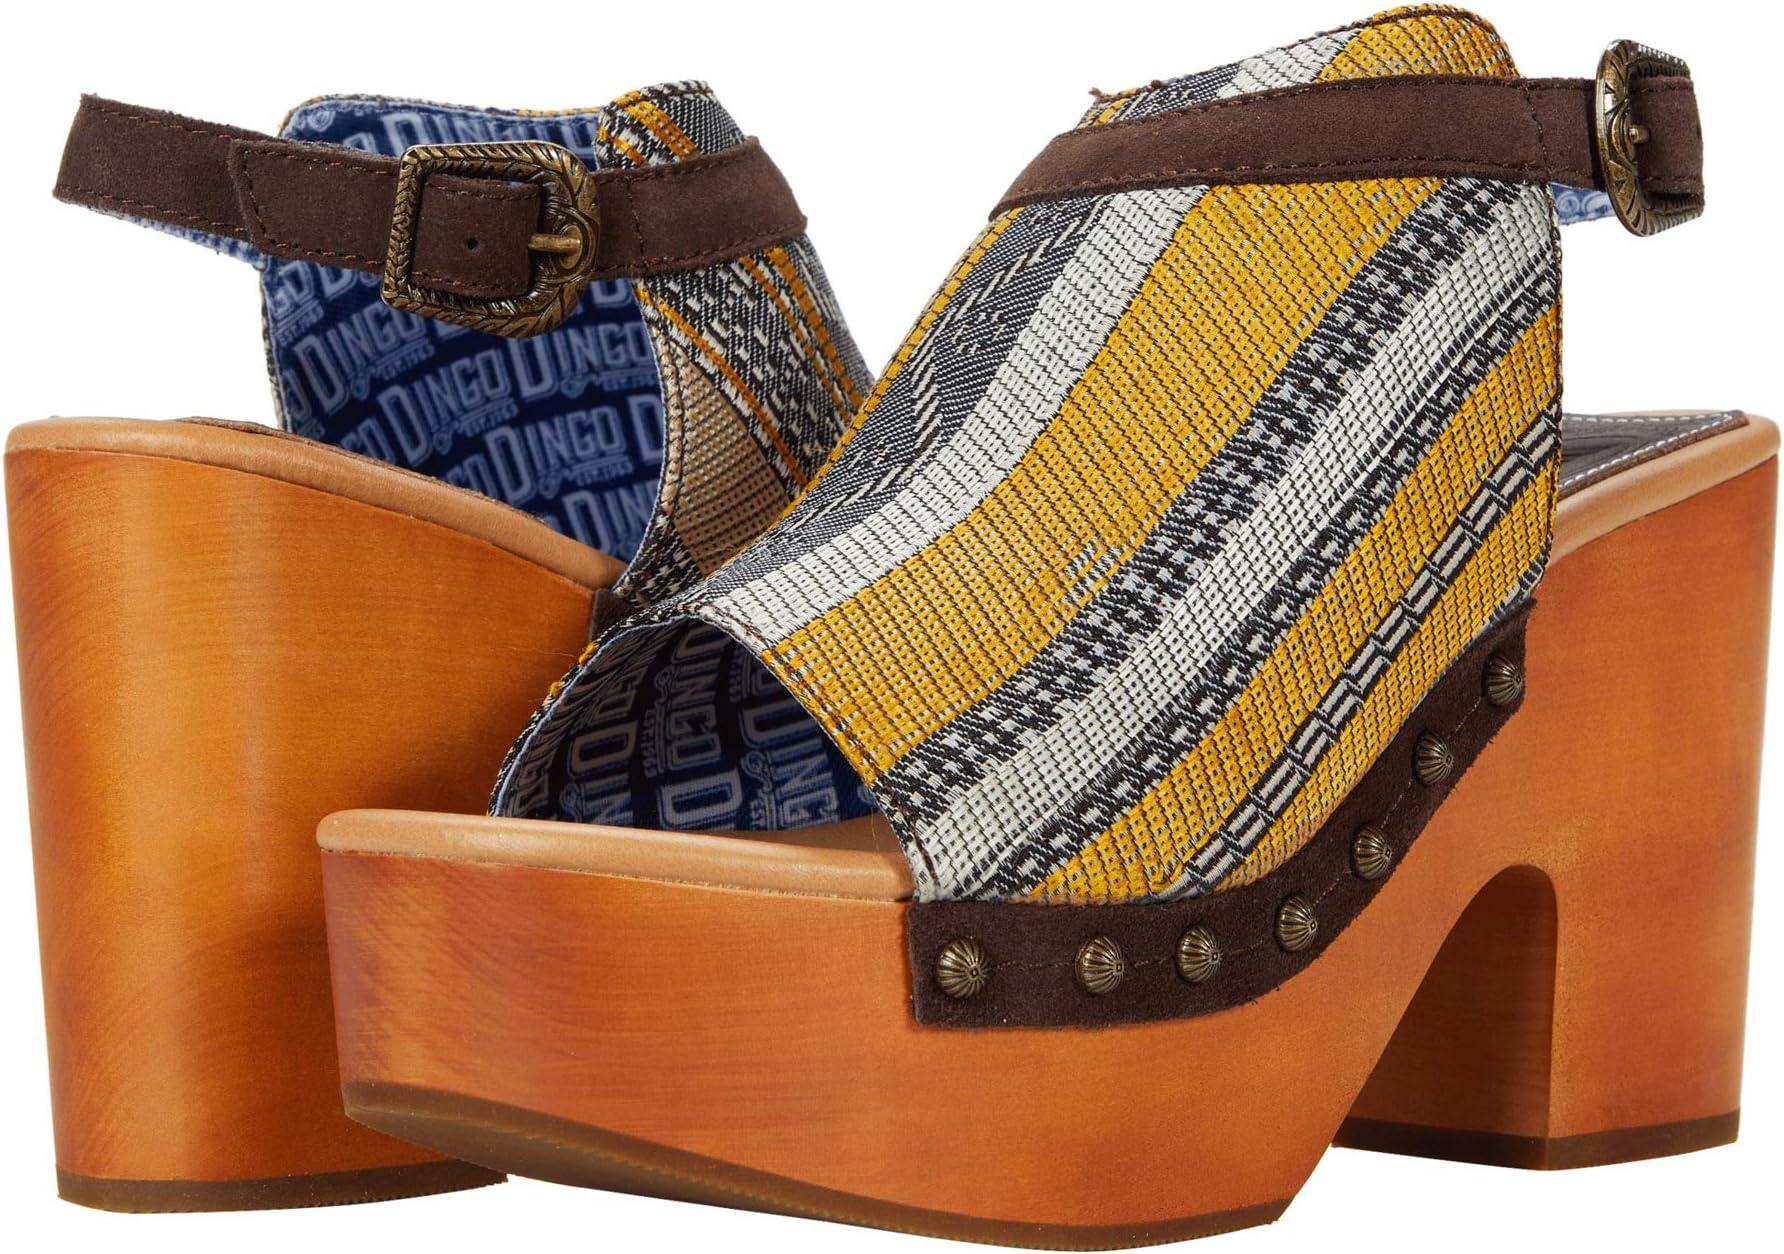 TC-1-Sandals-2020-08-31